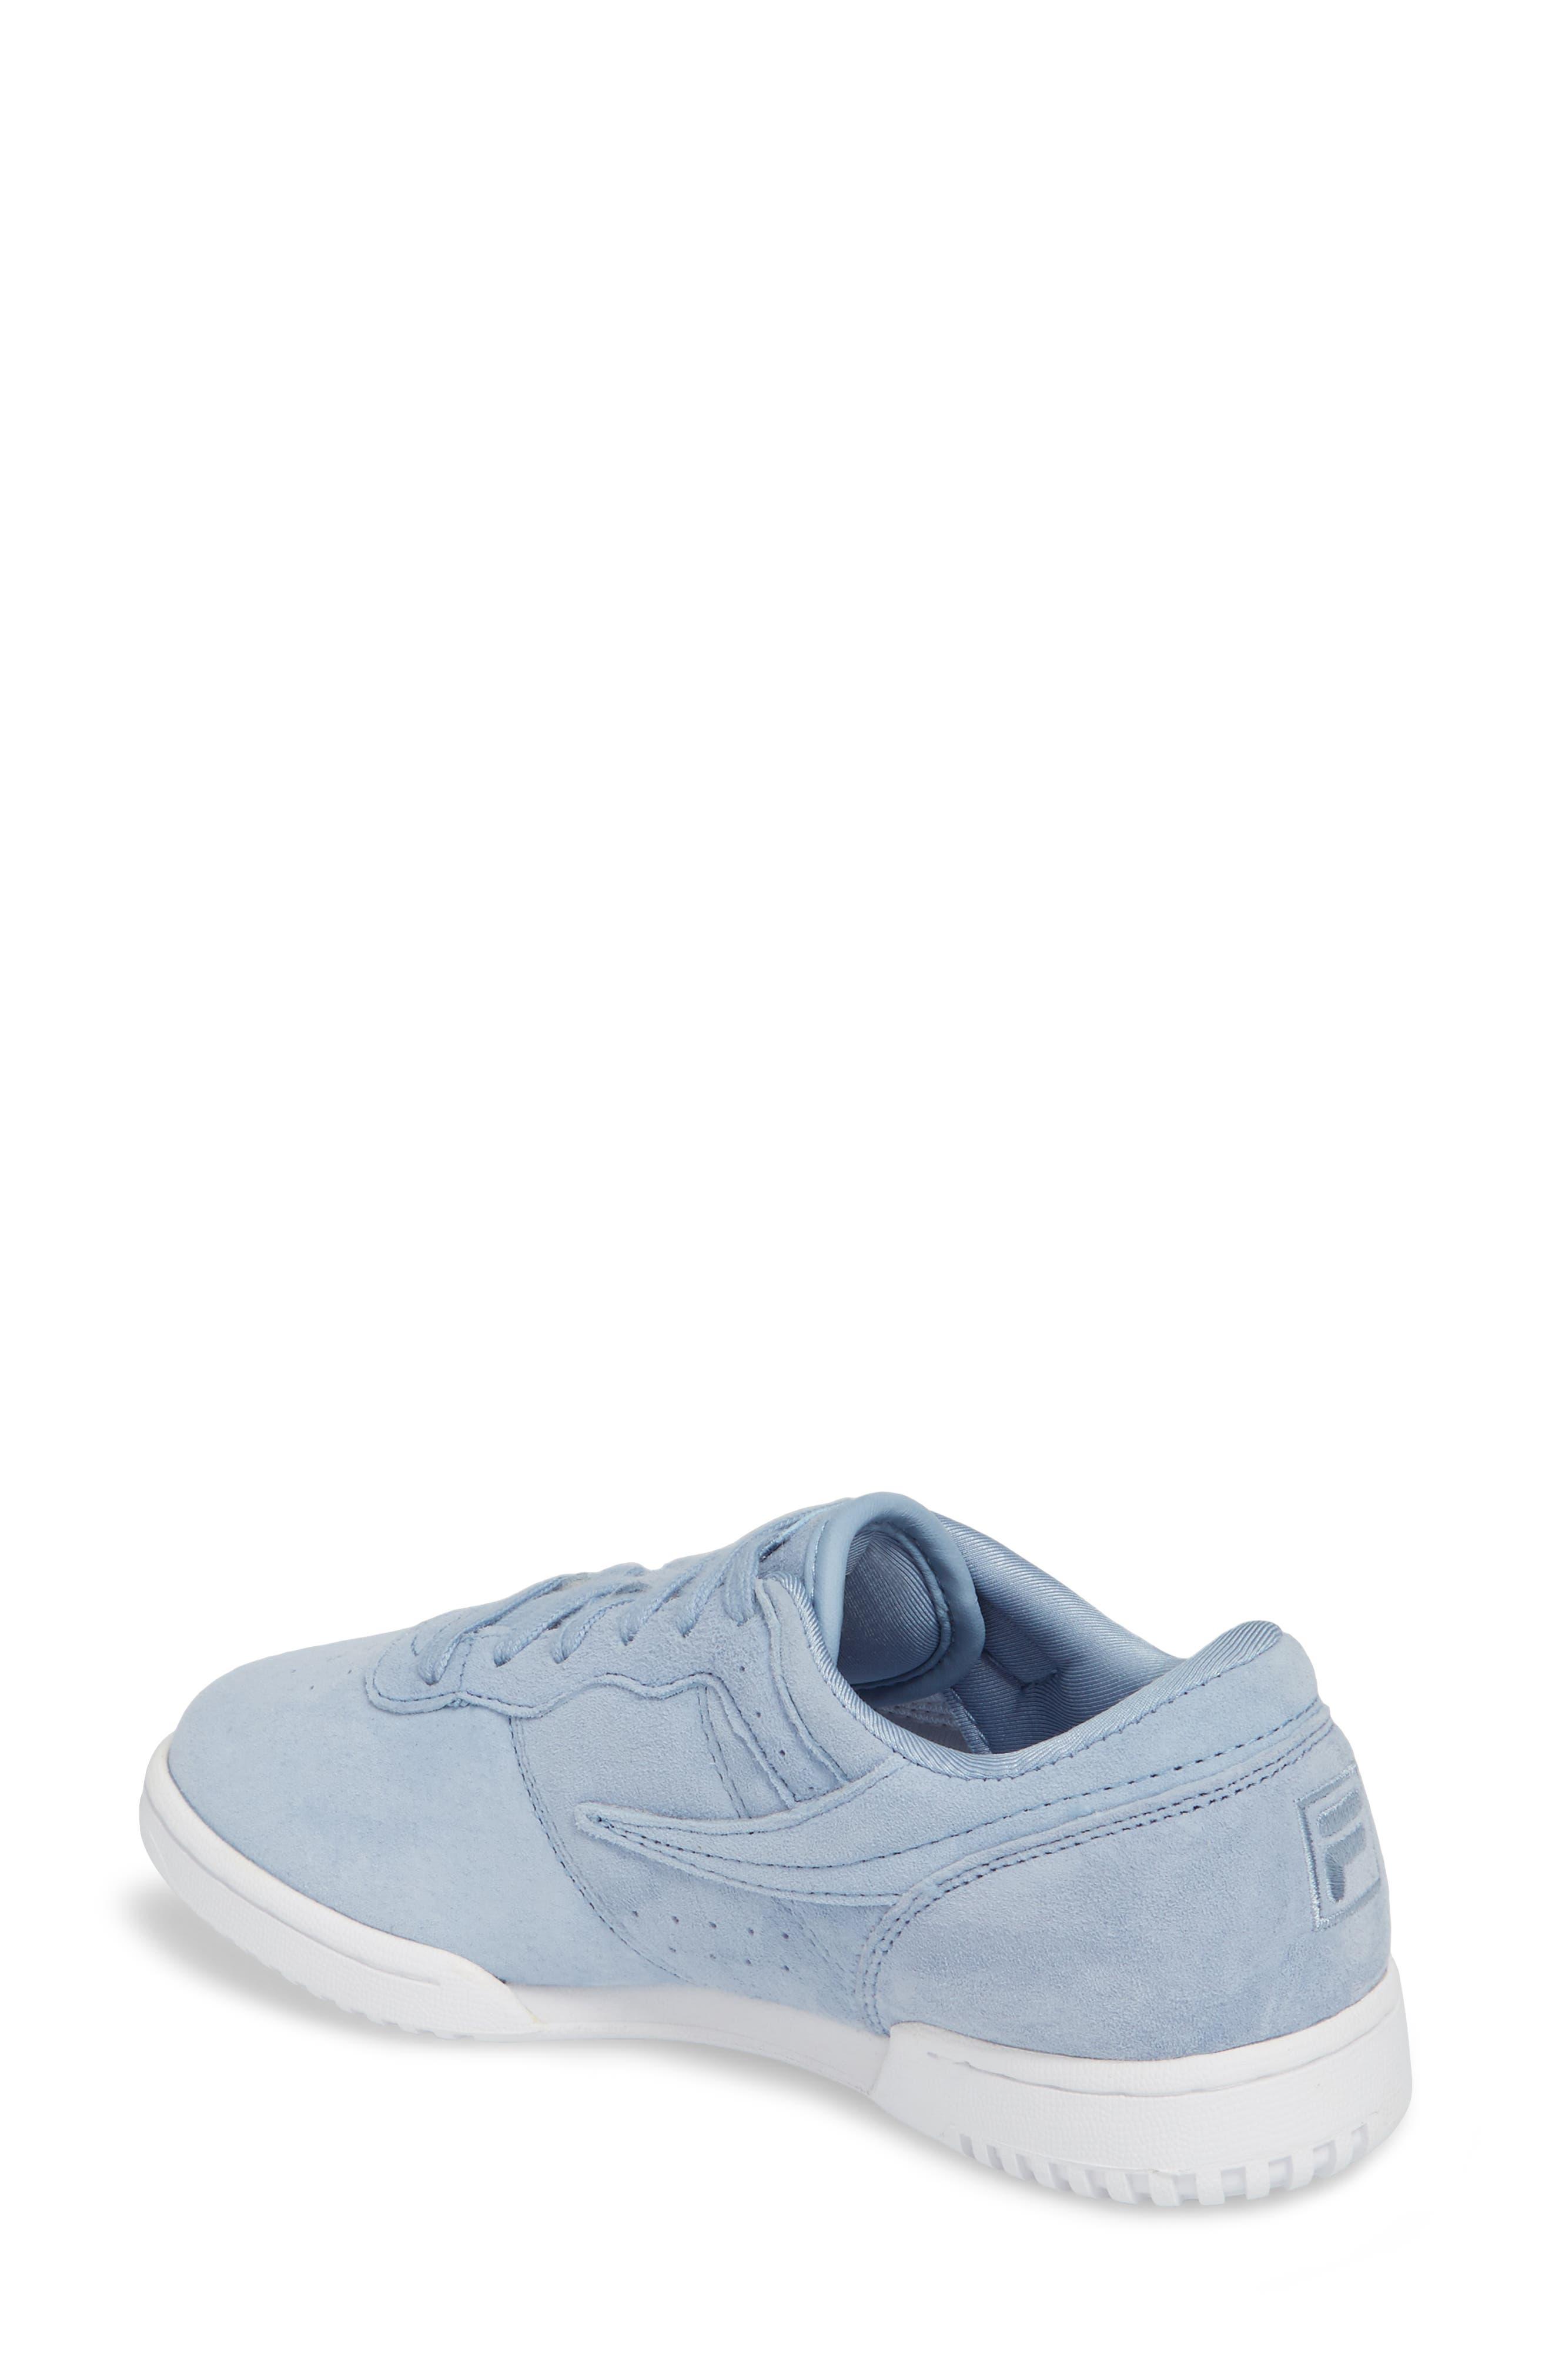 Original Fitness Premium Sneaker,                             Alternate thumbnail 2, color,                             BLUE/ WHITE